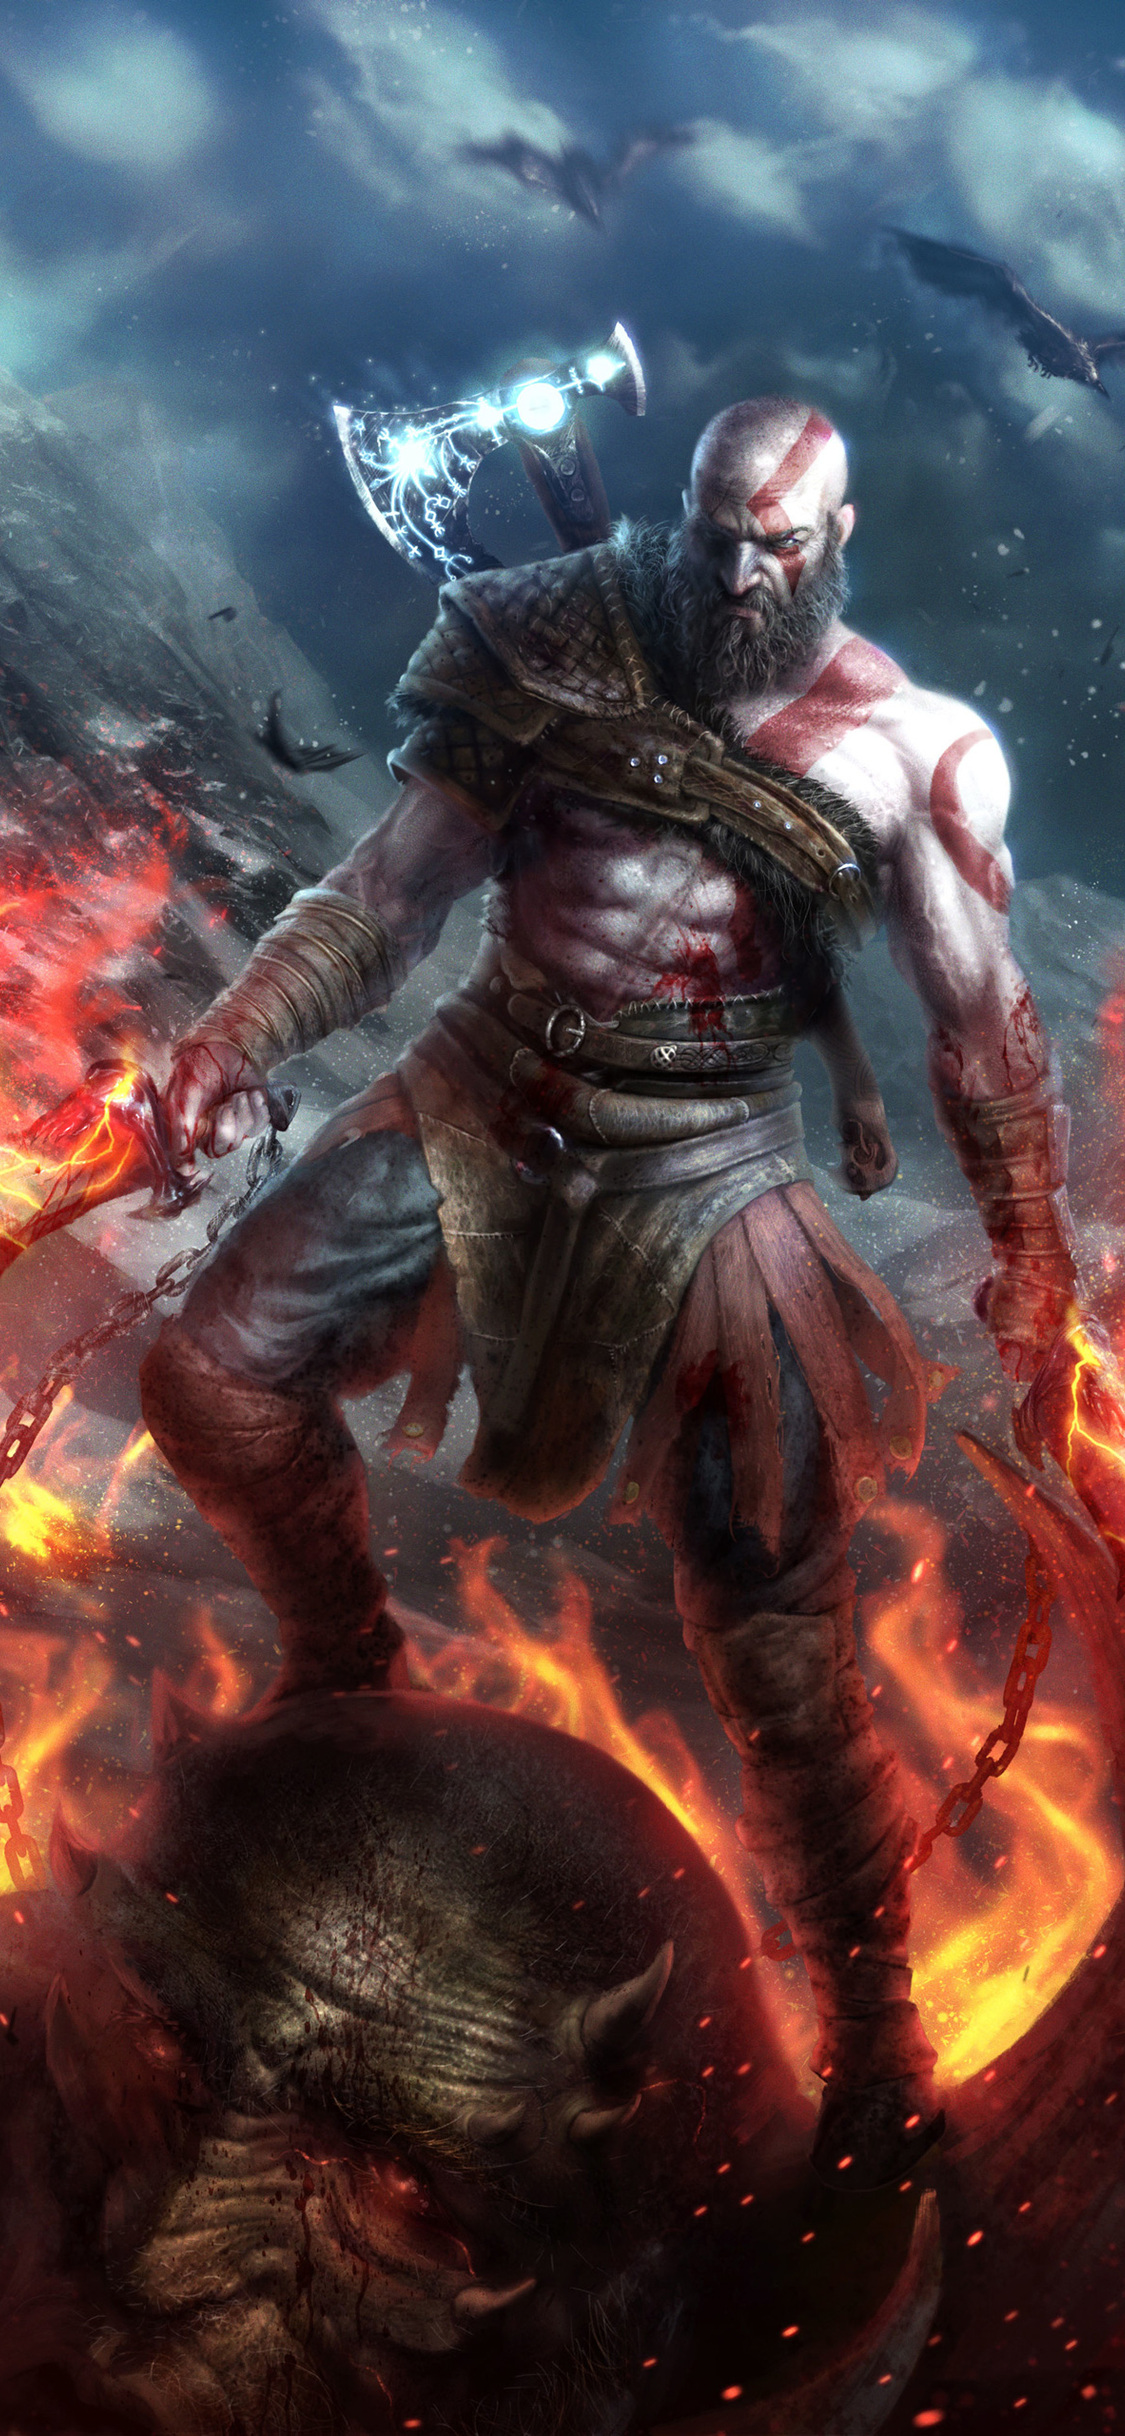 1125x2436 Kratos In God Of War Iphone XS,Iphone 10,Iphone ...